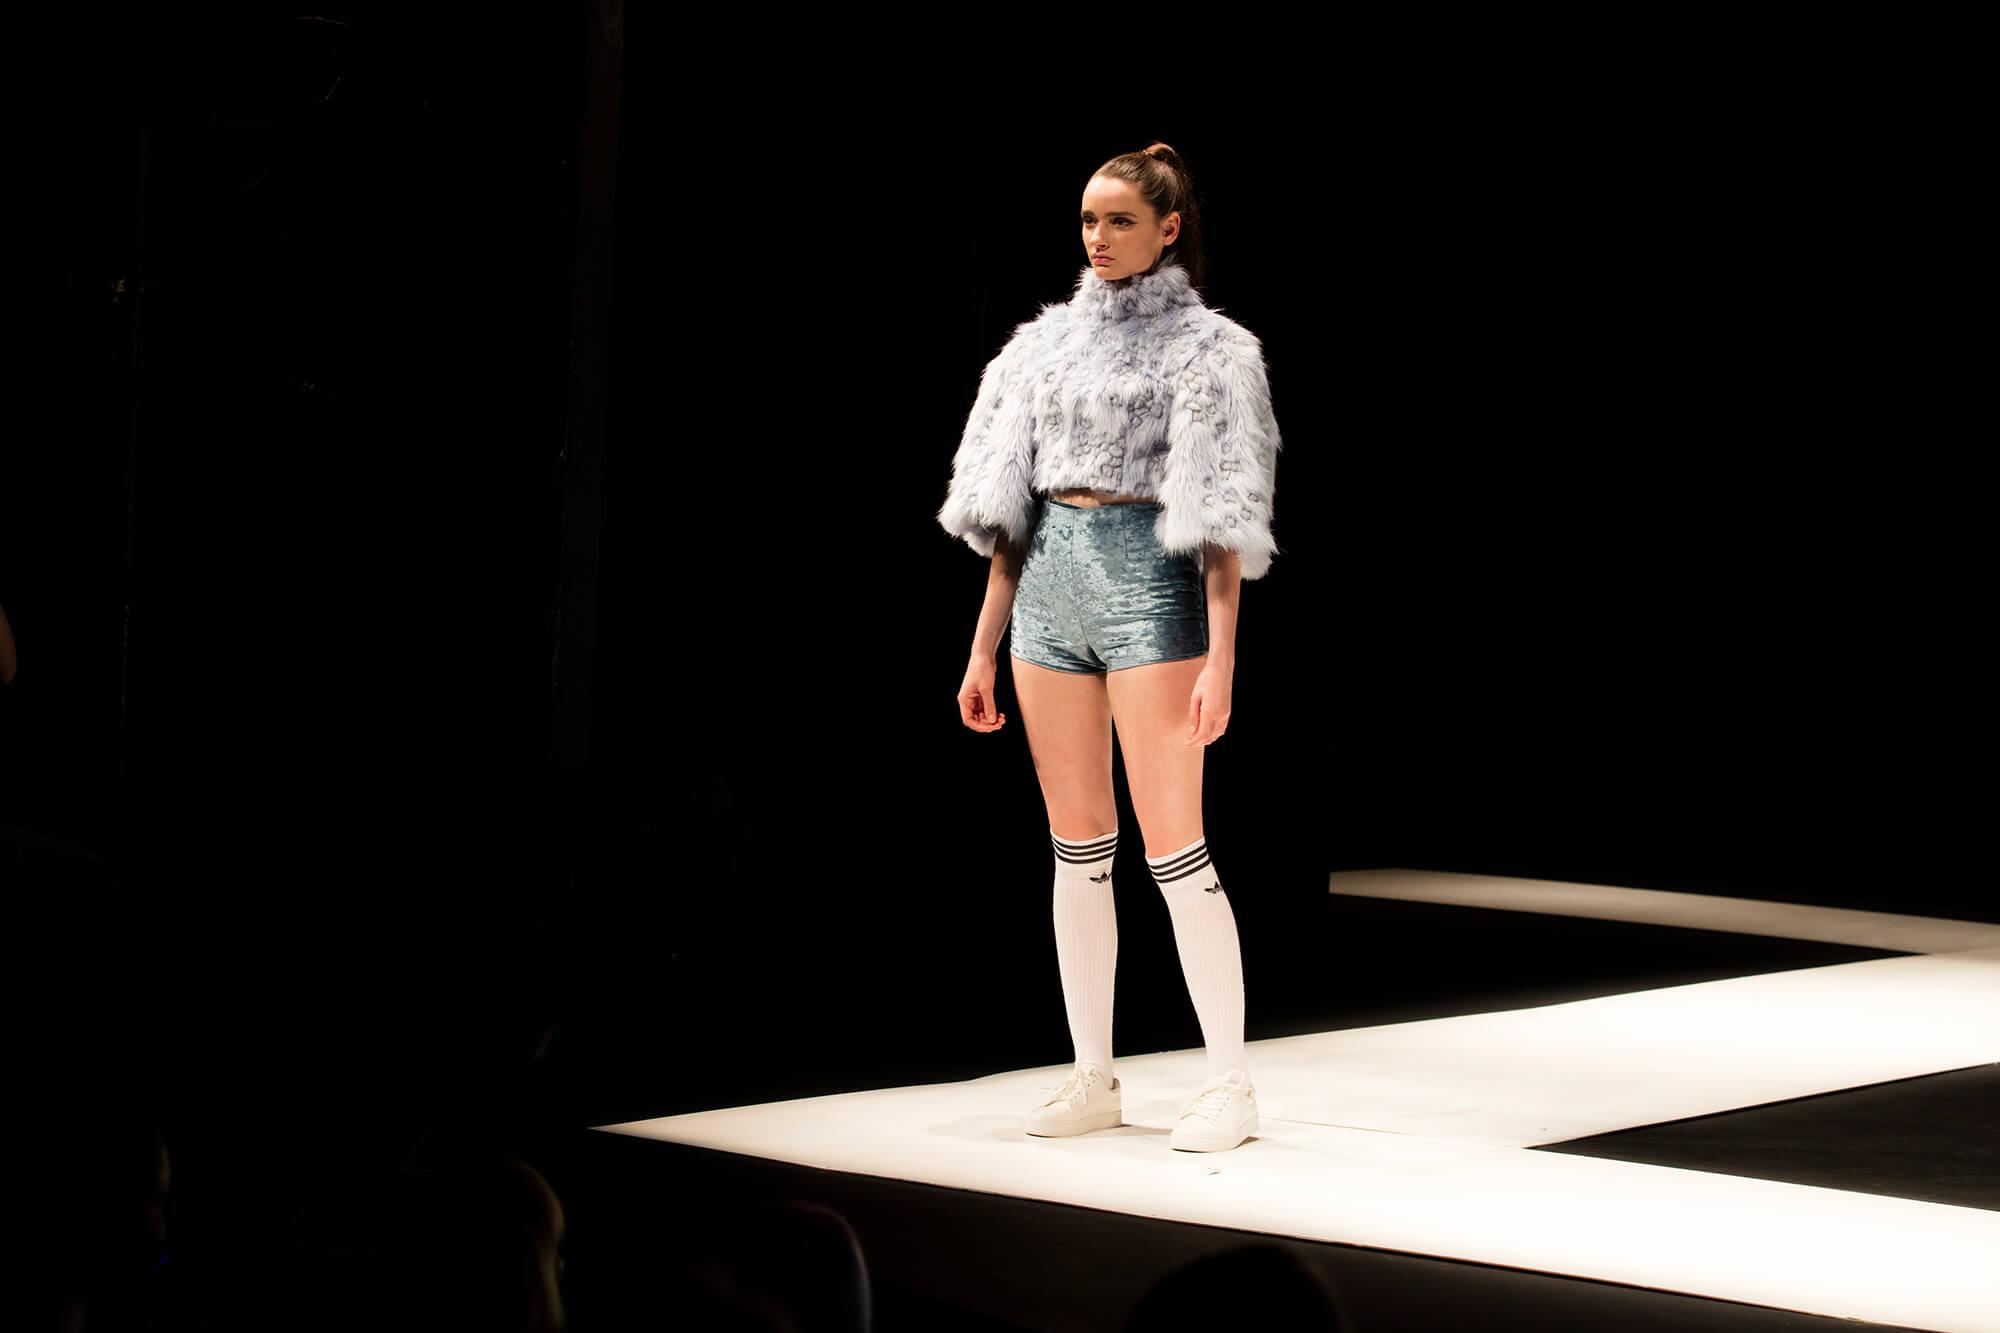 A female models sports socks, a furry jumper and velvet shorts on a catwalk